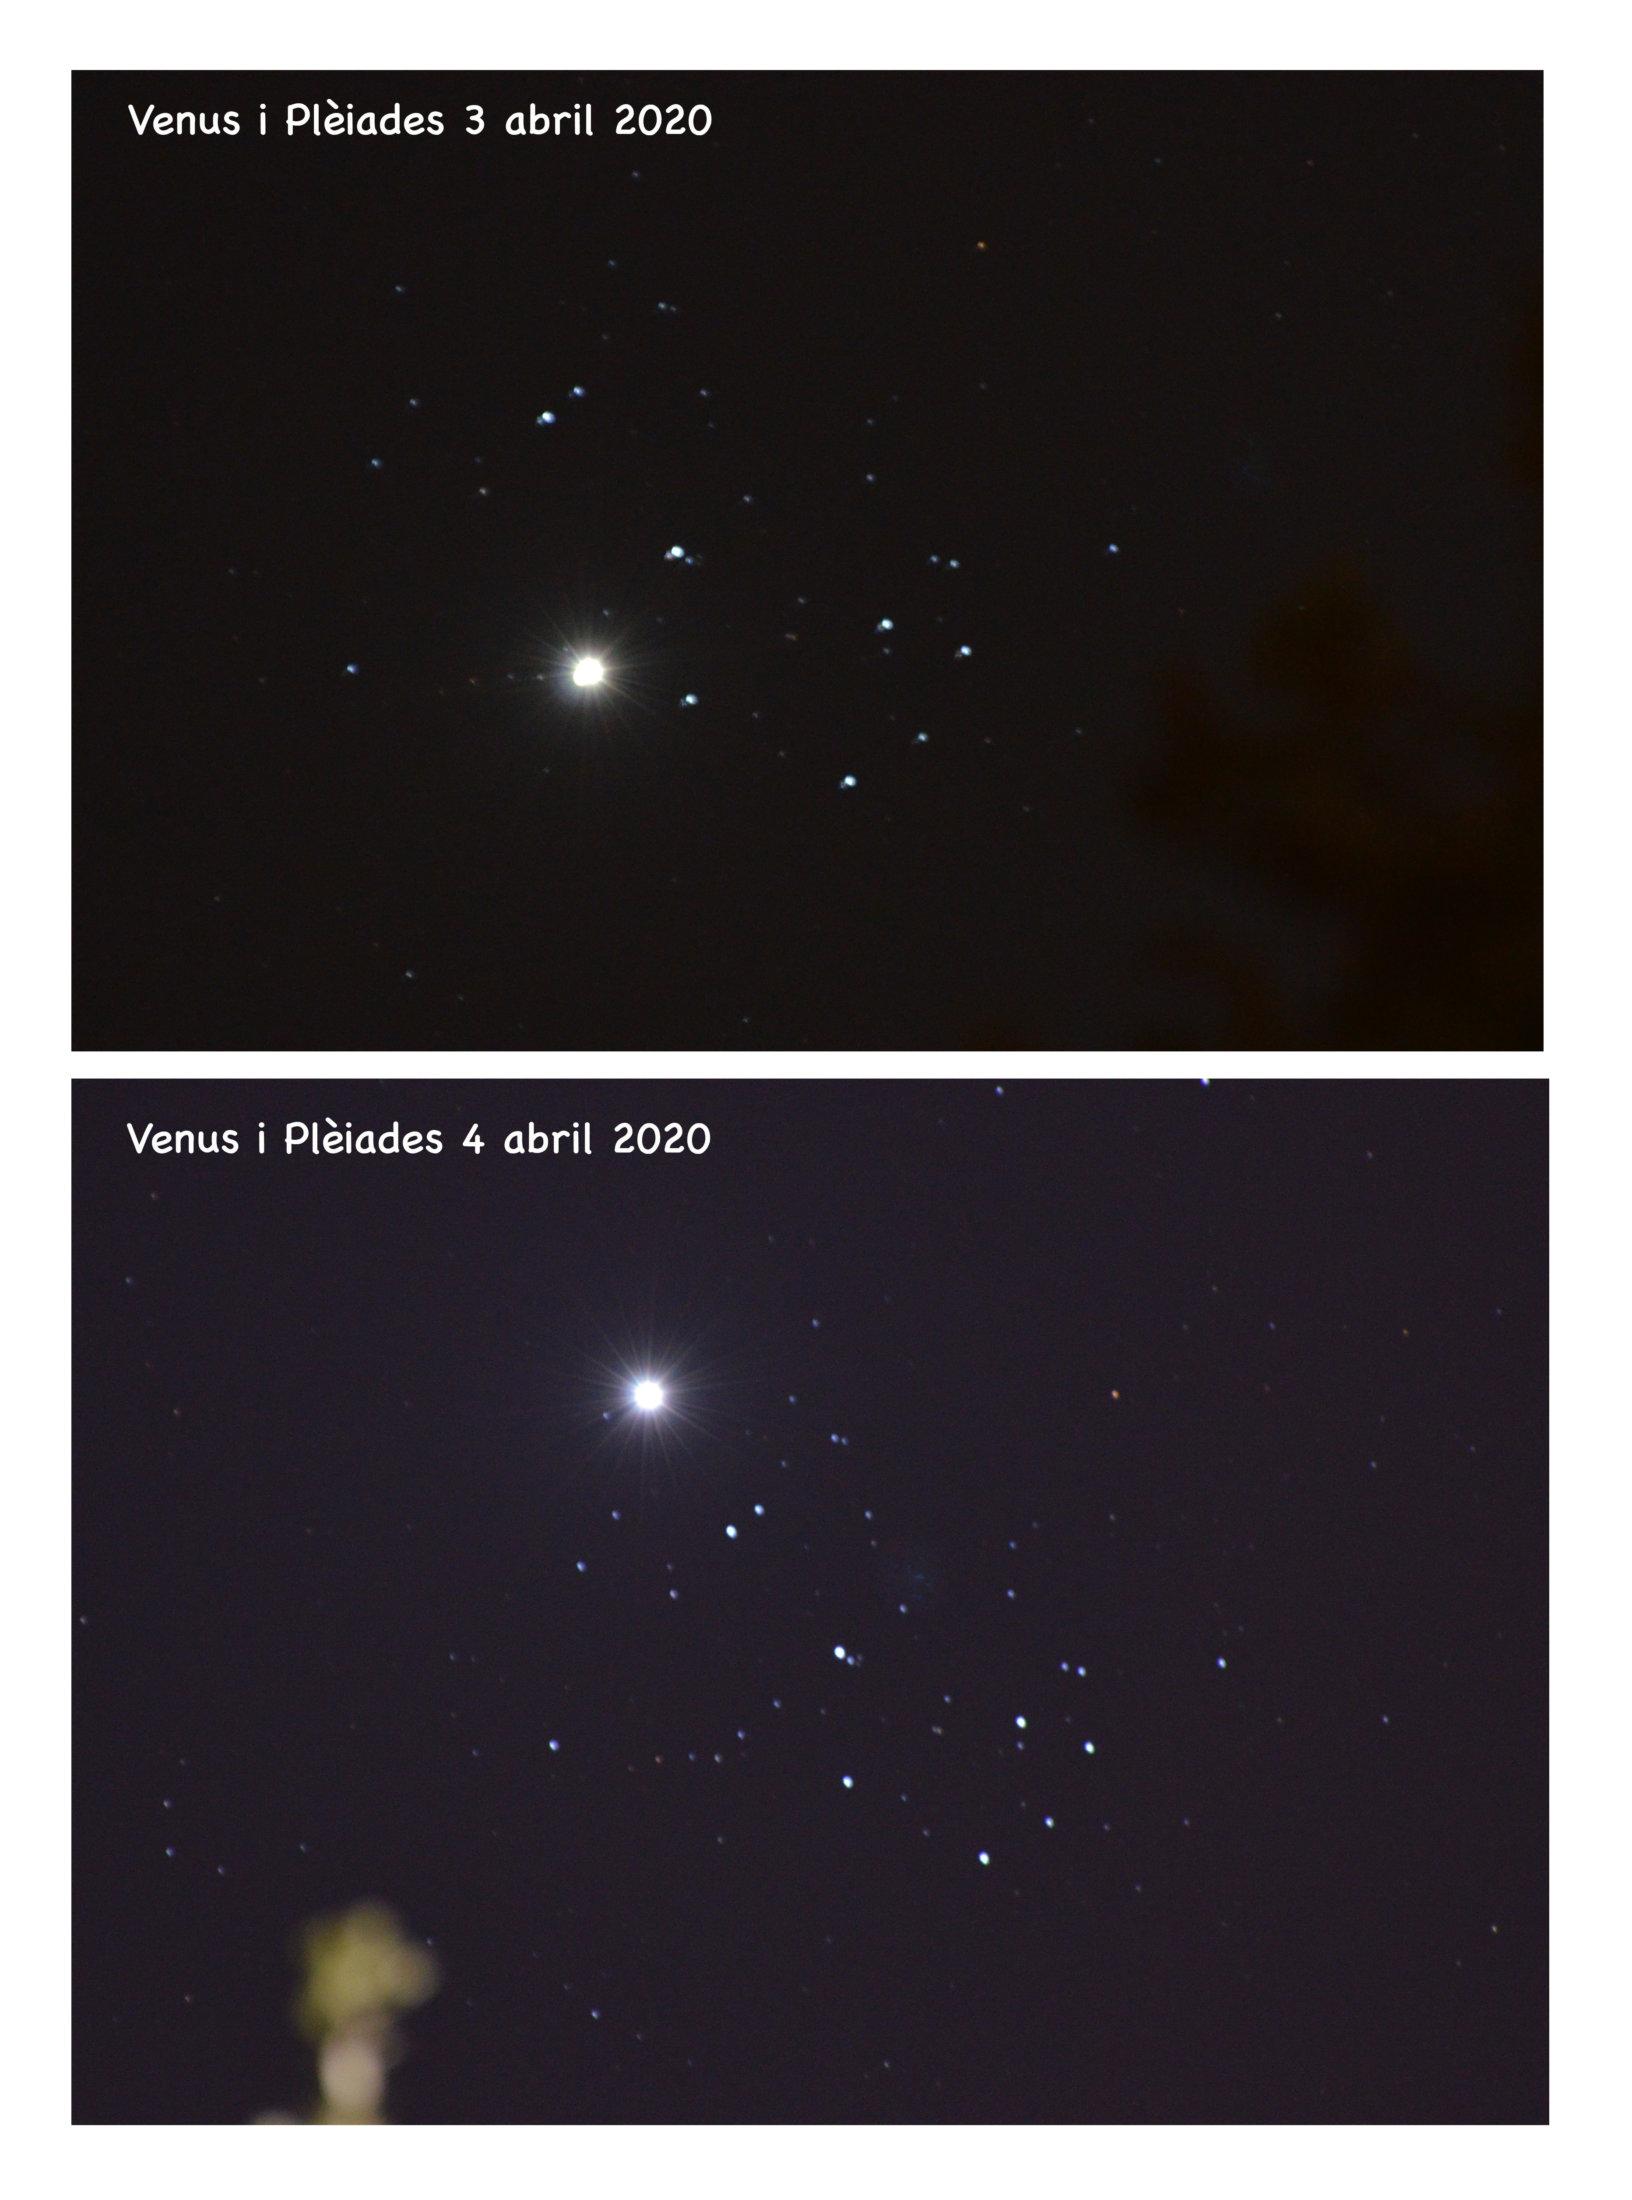 Venus i Pleiades - Mercè Monzonís